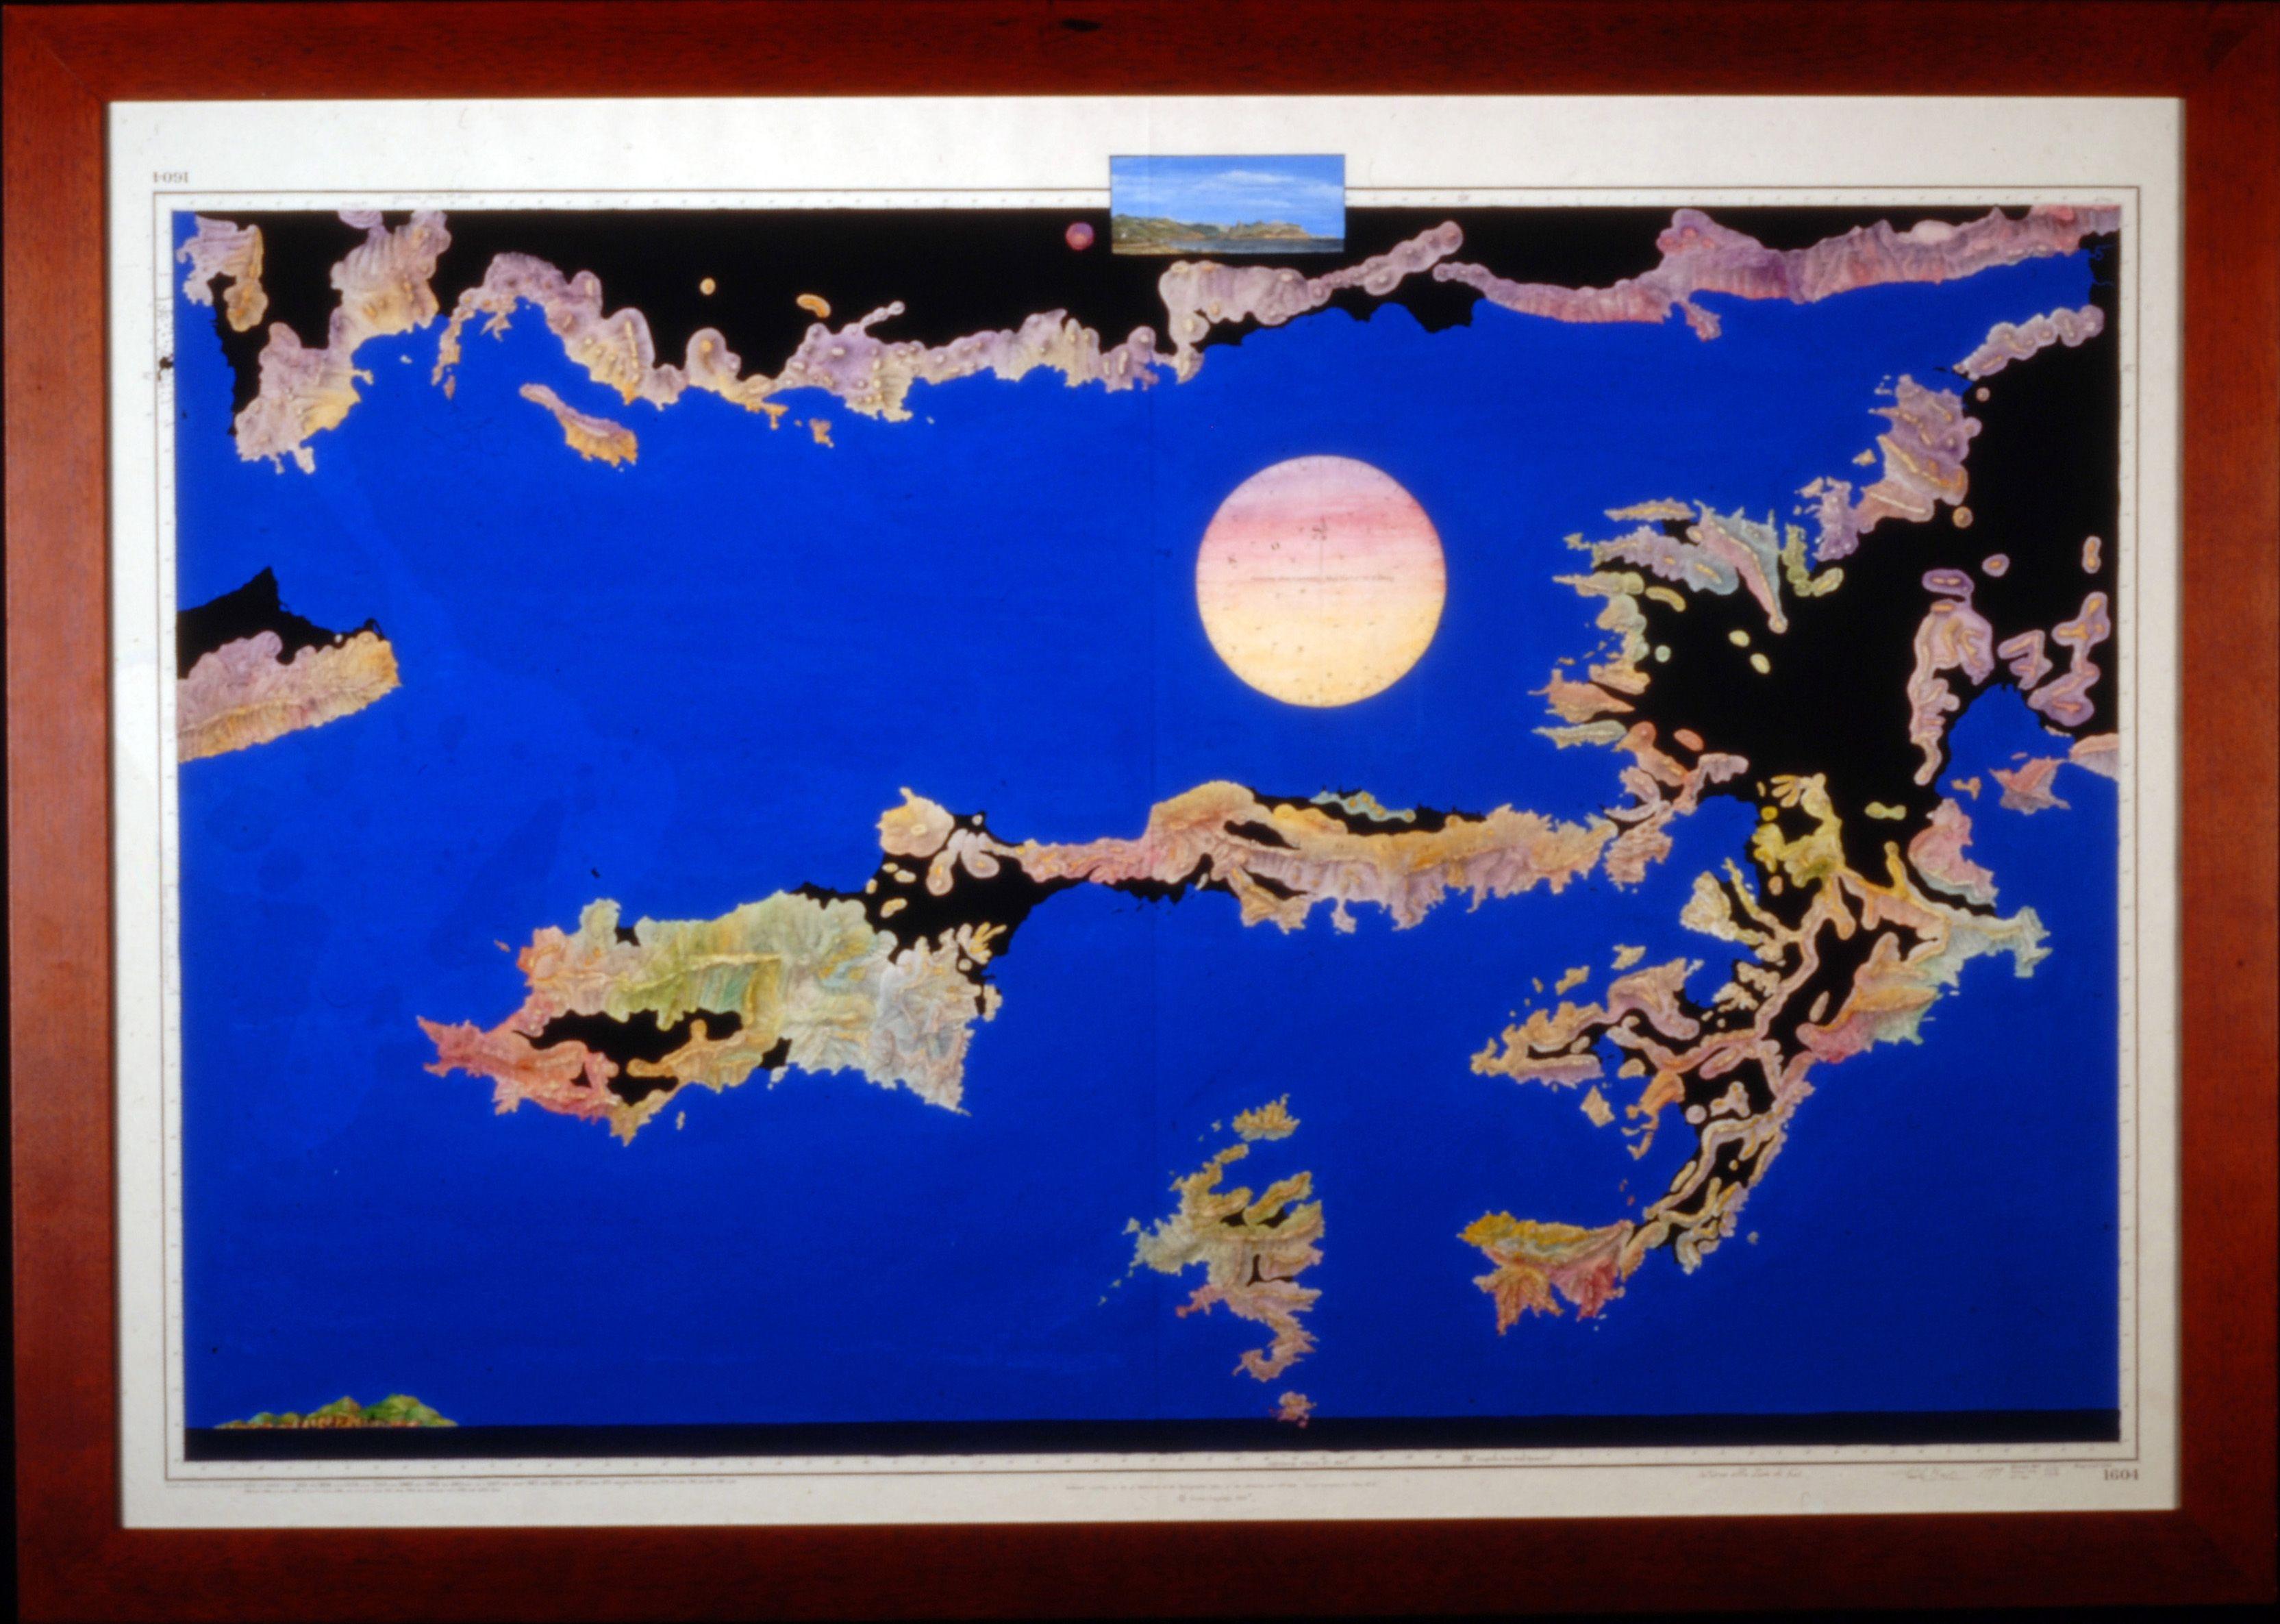 Around the Moon of Kos (Paolo Buzi, Nautical Charts 1999)